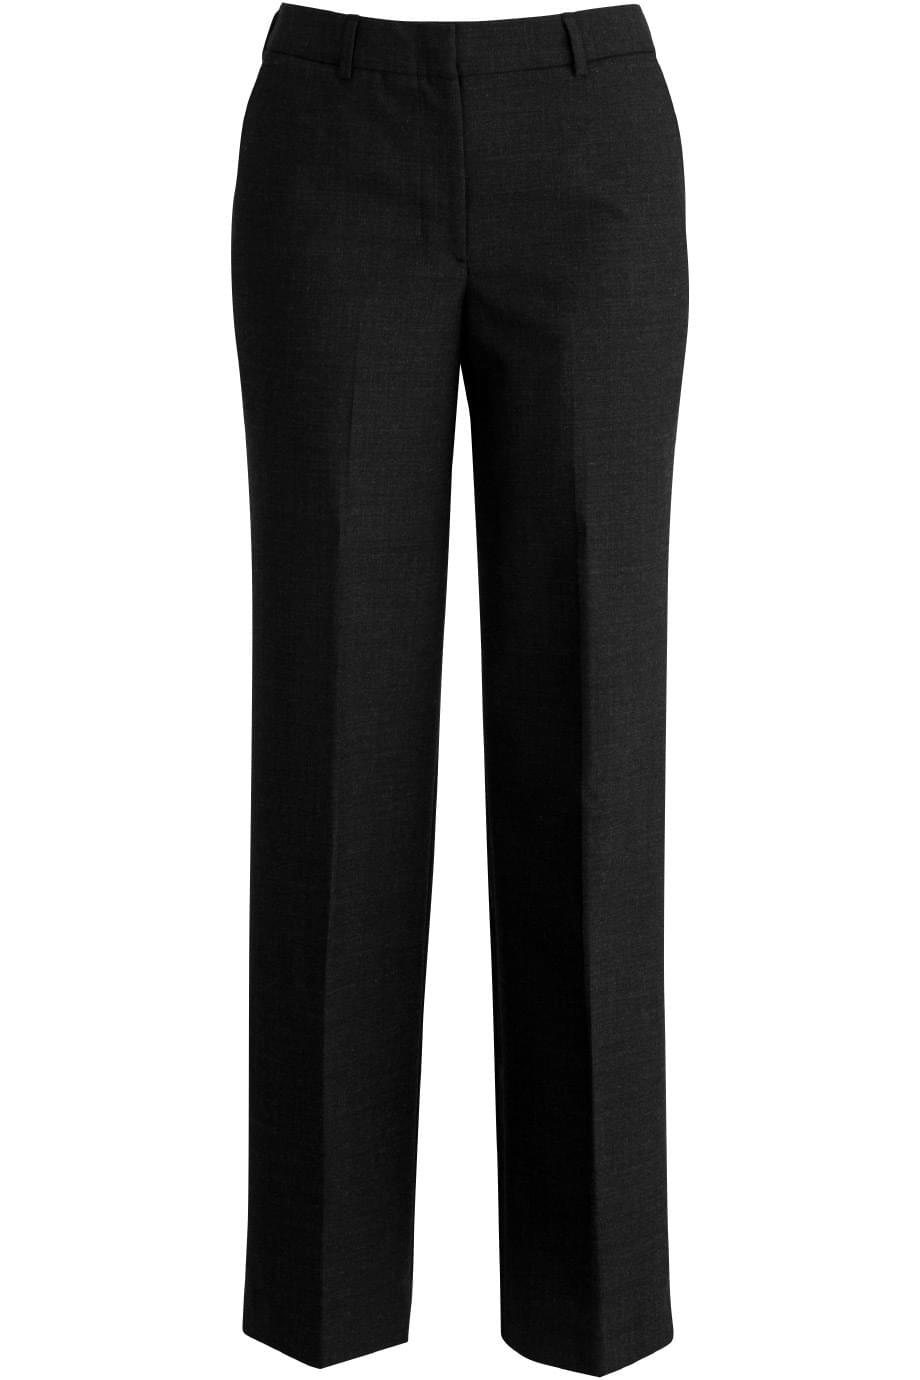 REDWOOD & ROSS® SIGNATURE EZ FIT DRESS PANT